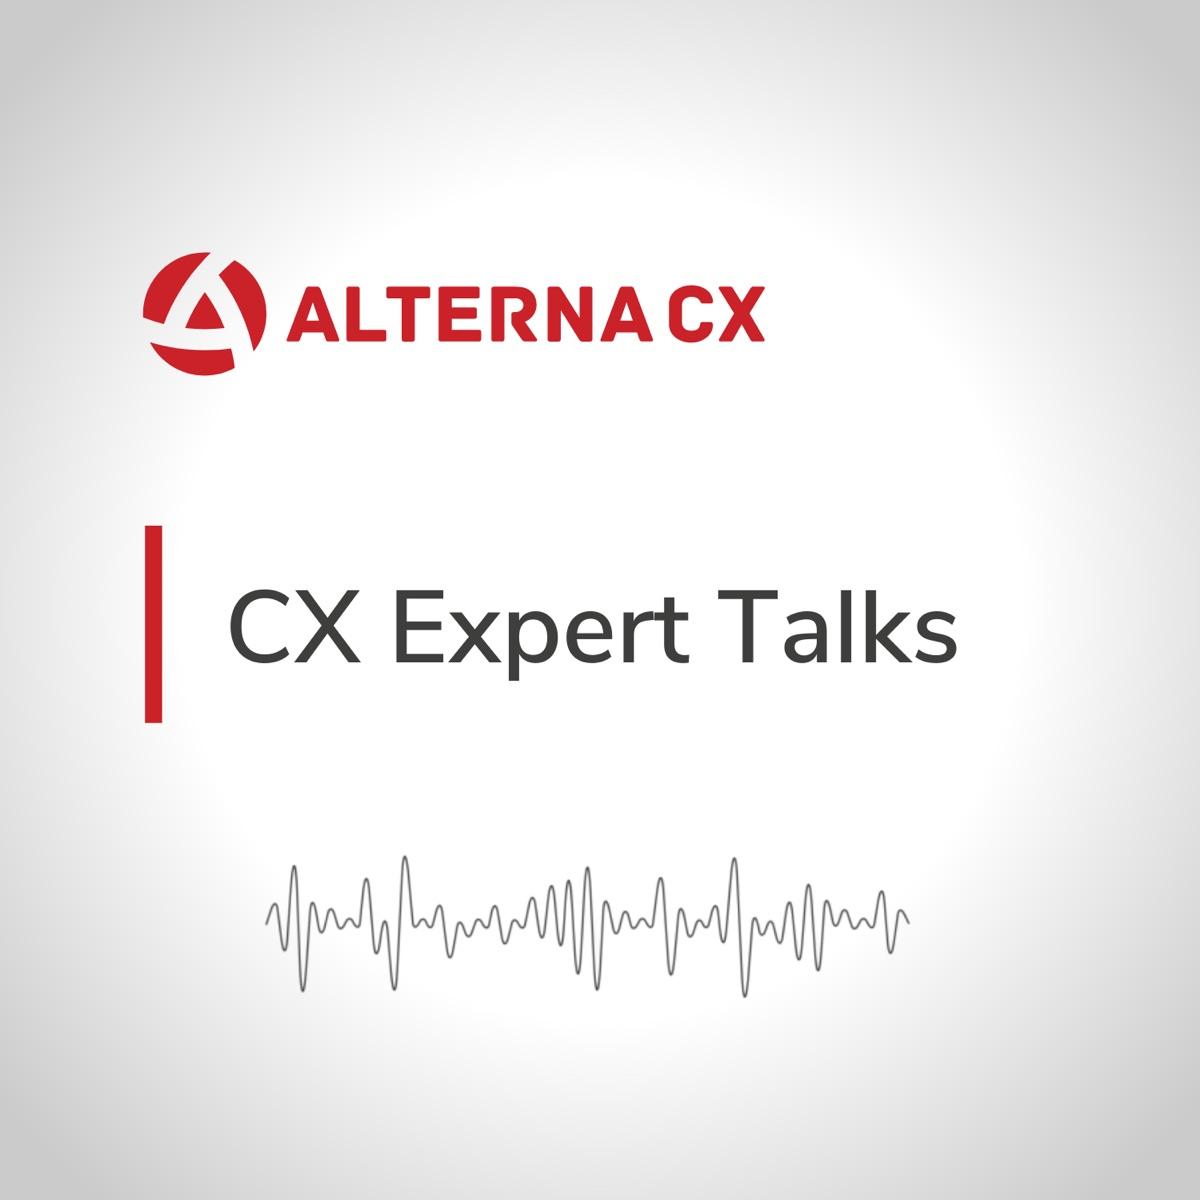 CX Expert Talks